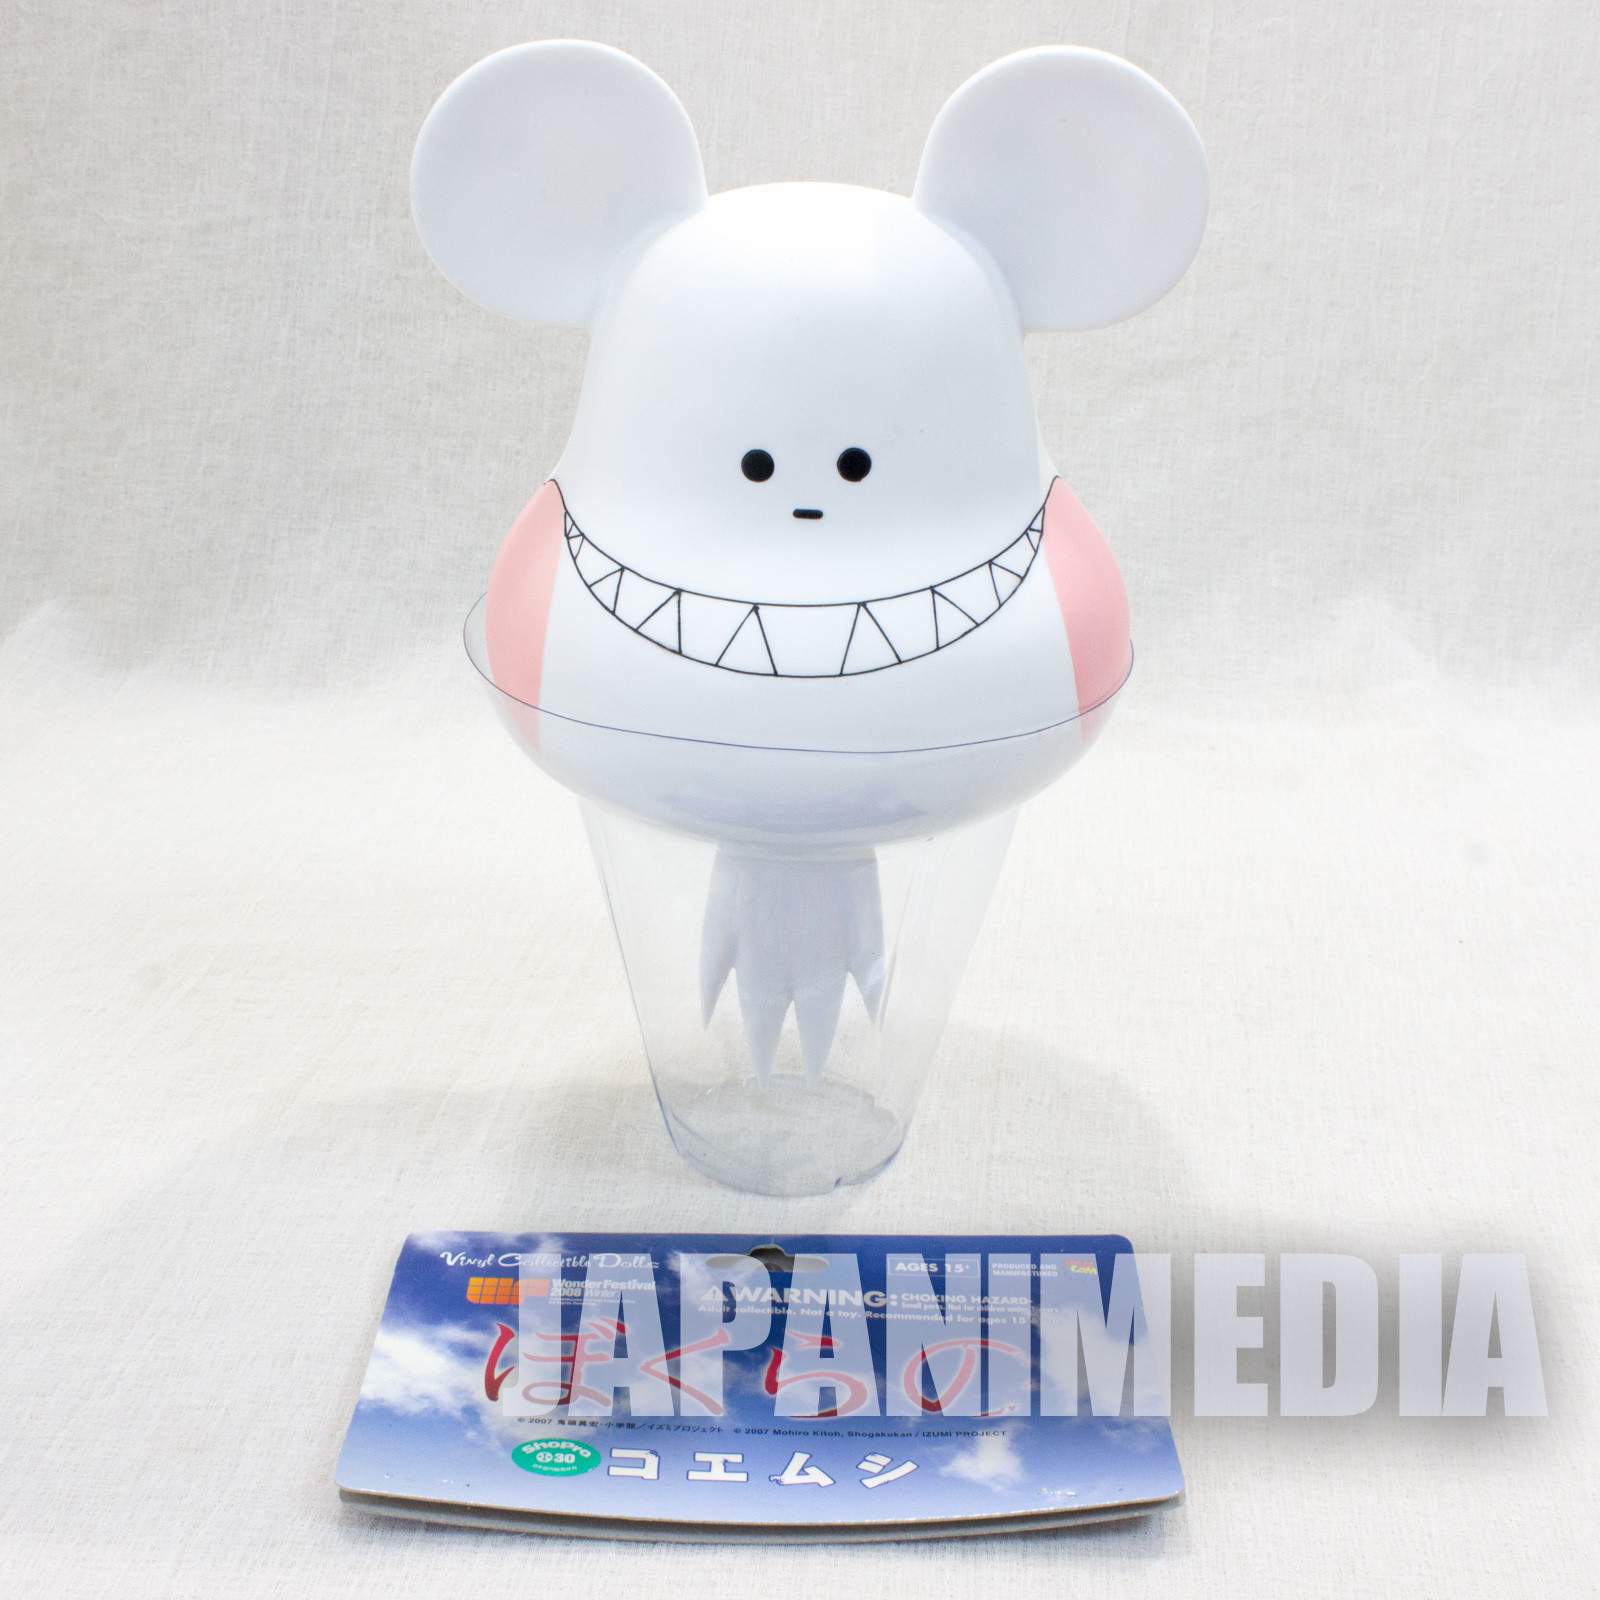 RARE! Bokurano : Ours Koyemshi Figure VCD Medicom Toy Wonder Festival 2009 JAPAN